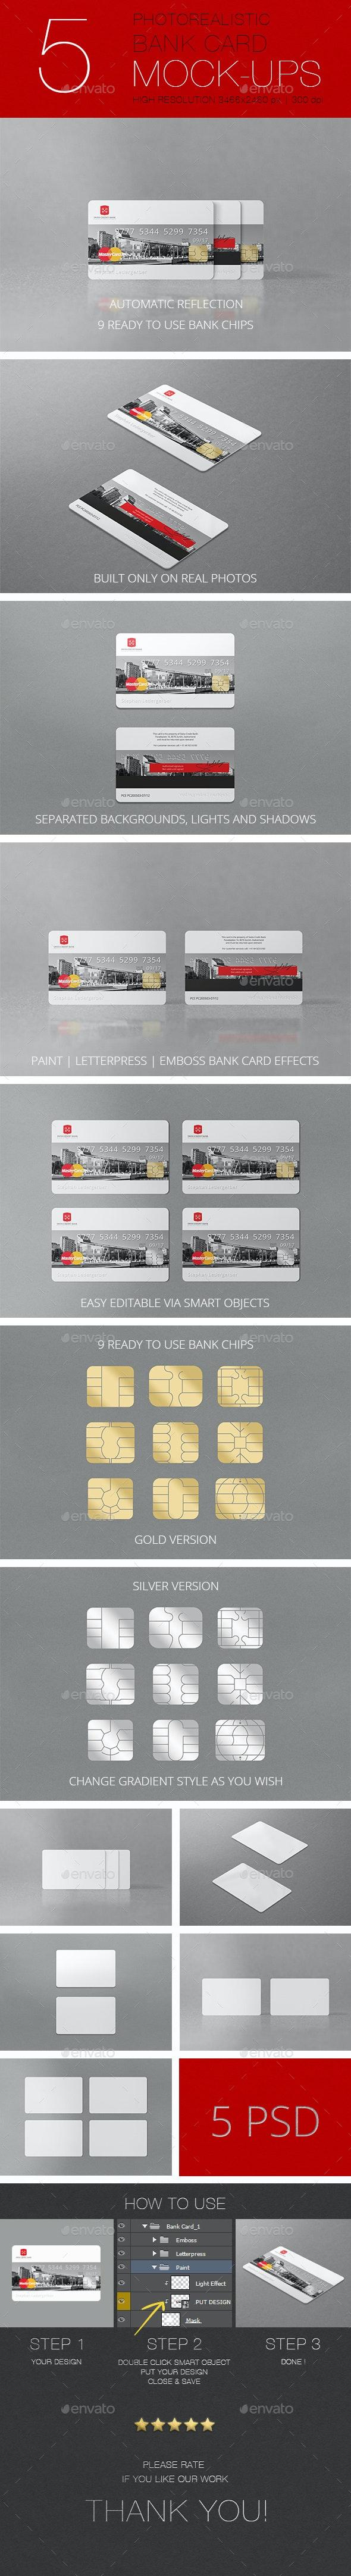 Photorealistic Bank Card Mockup - Miscellaneous Print